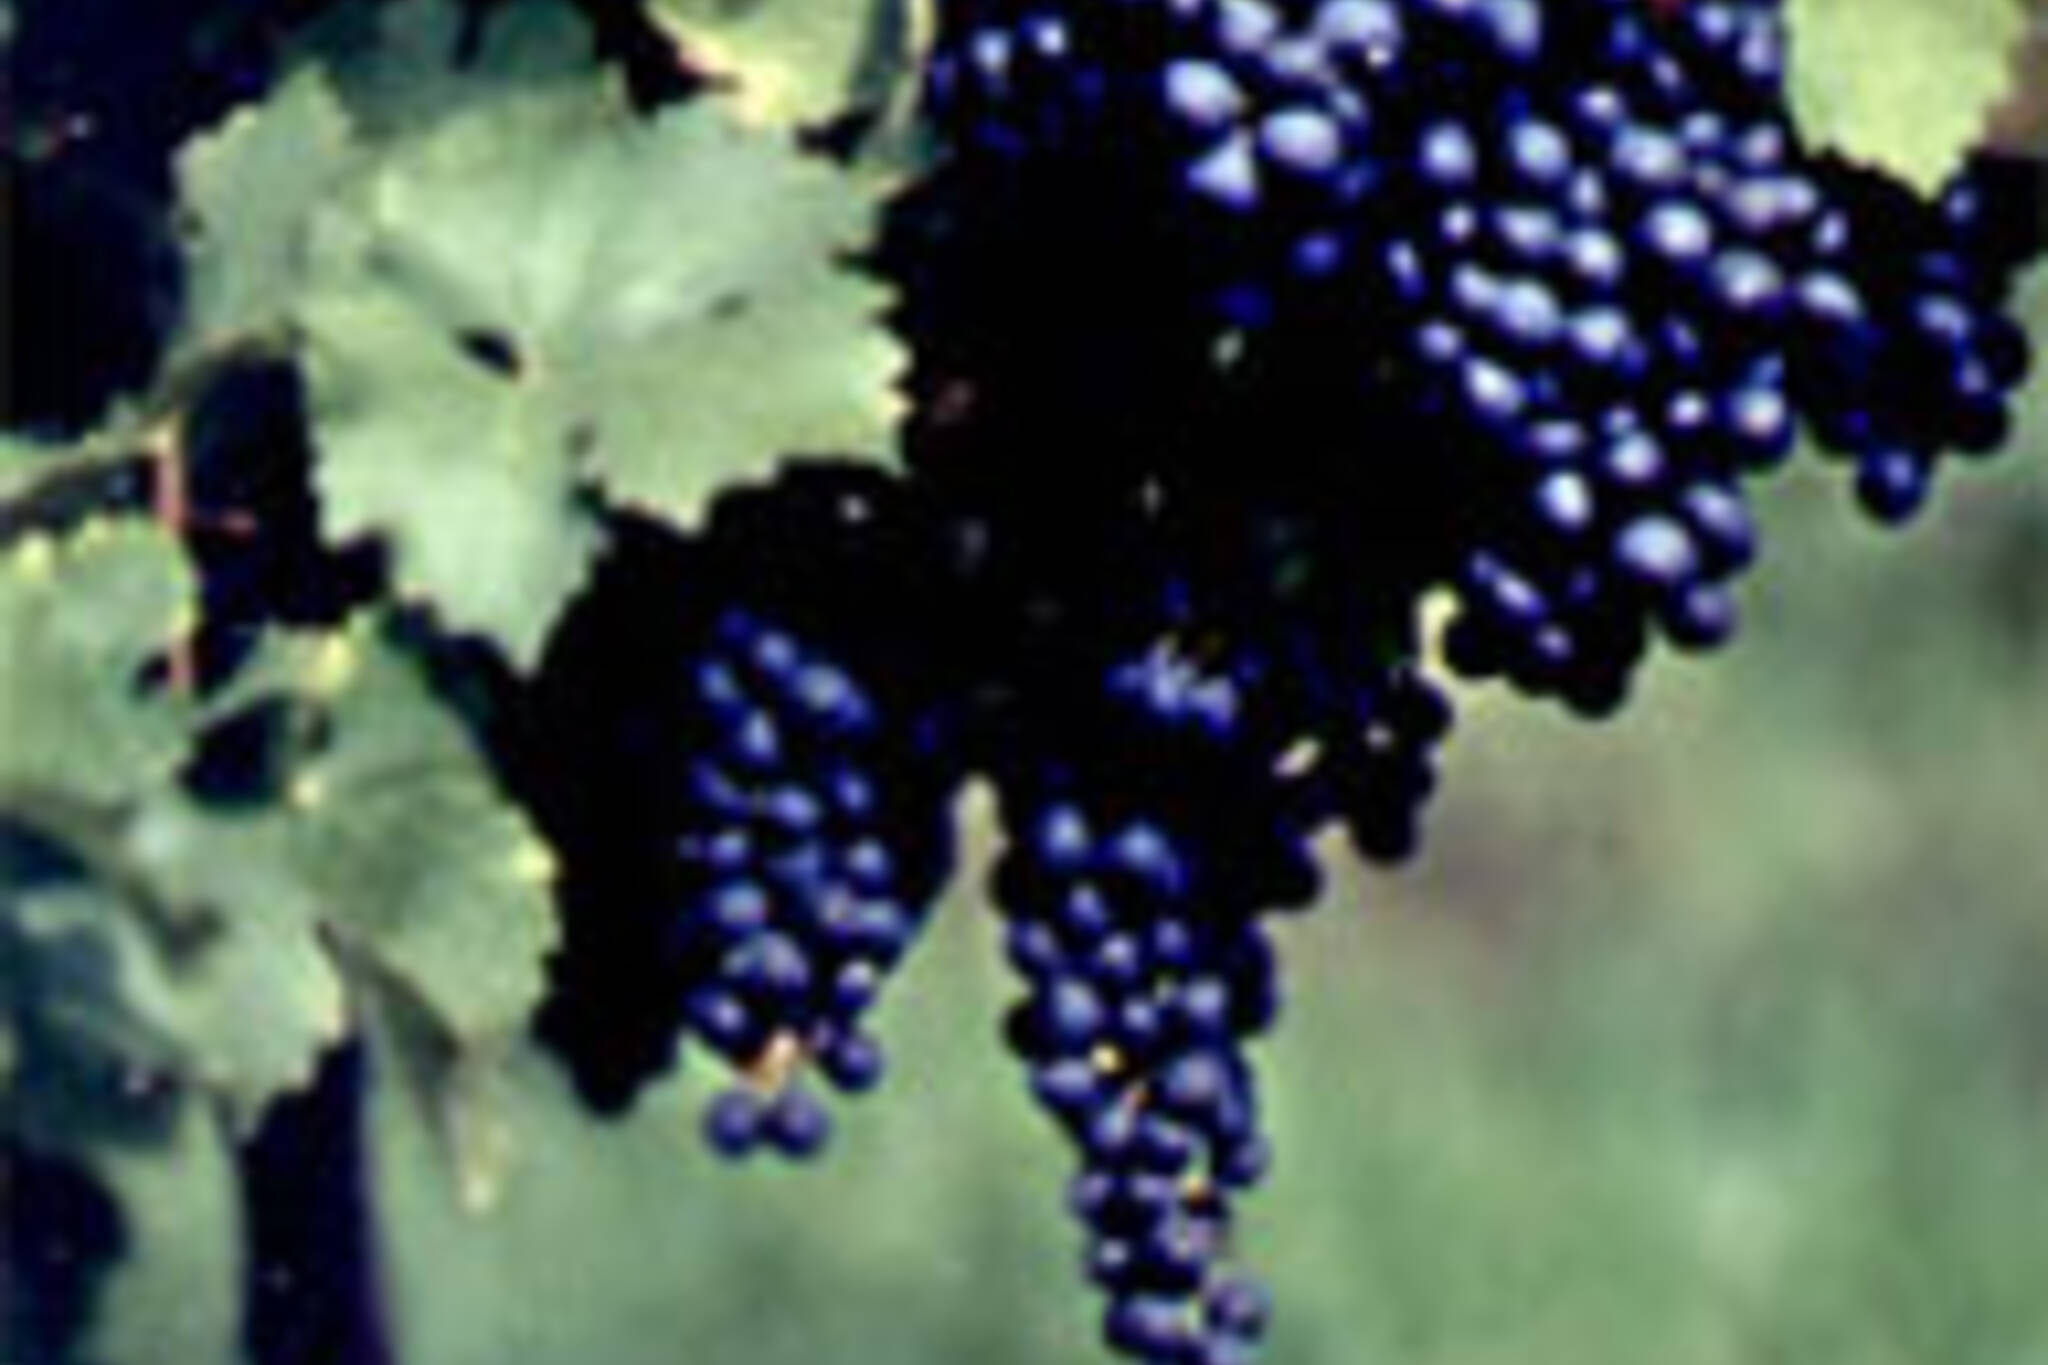 Cabernet Franc Grapes at the Henry of Pelham vineyard (from www.henryofpelham.com)